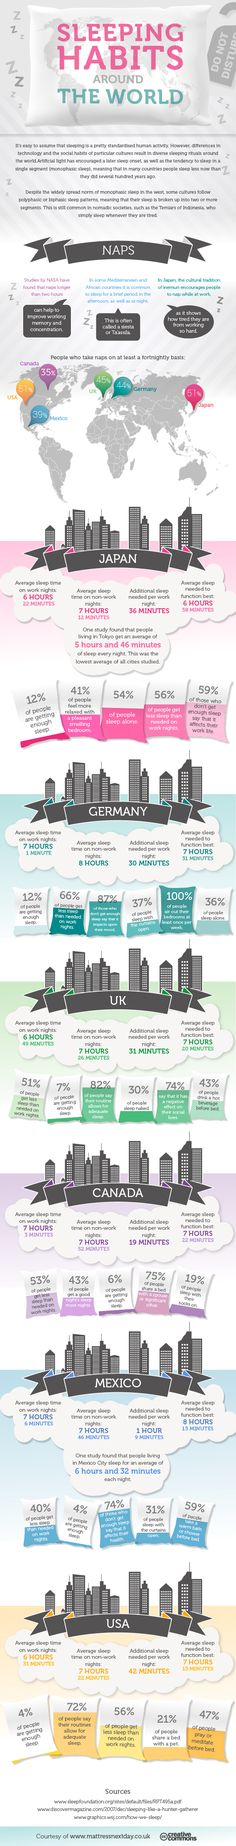 Sleeping Habits Around The World #infographic #Sleep #Health